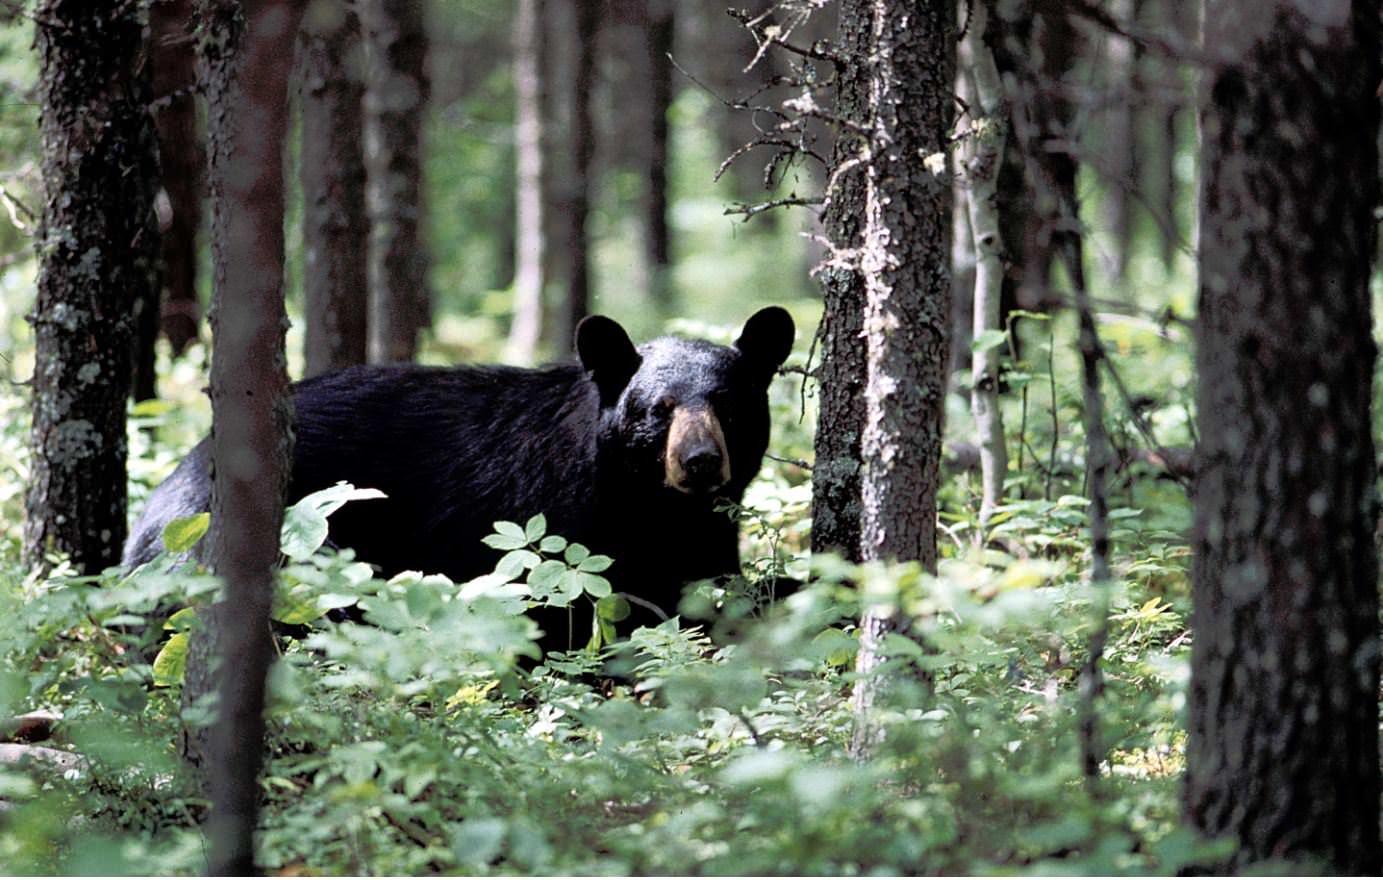 A black bear walking in between tall trees